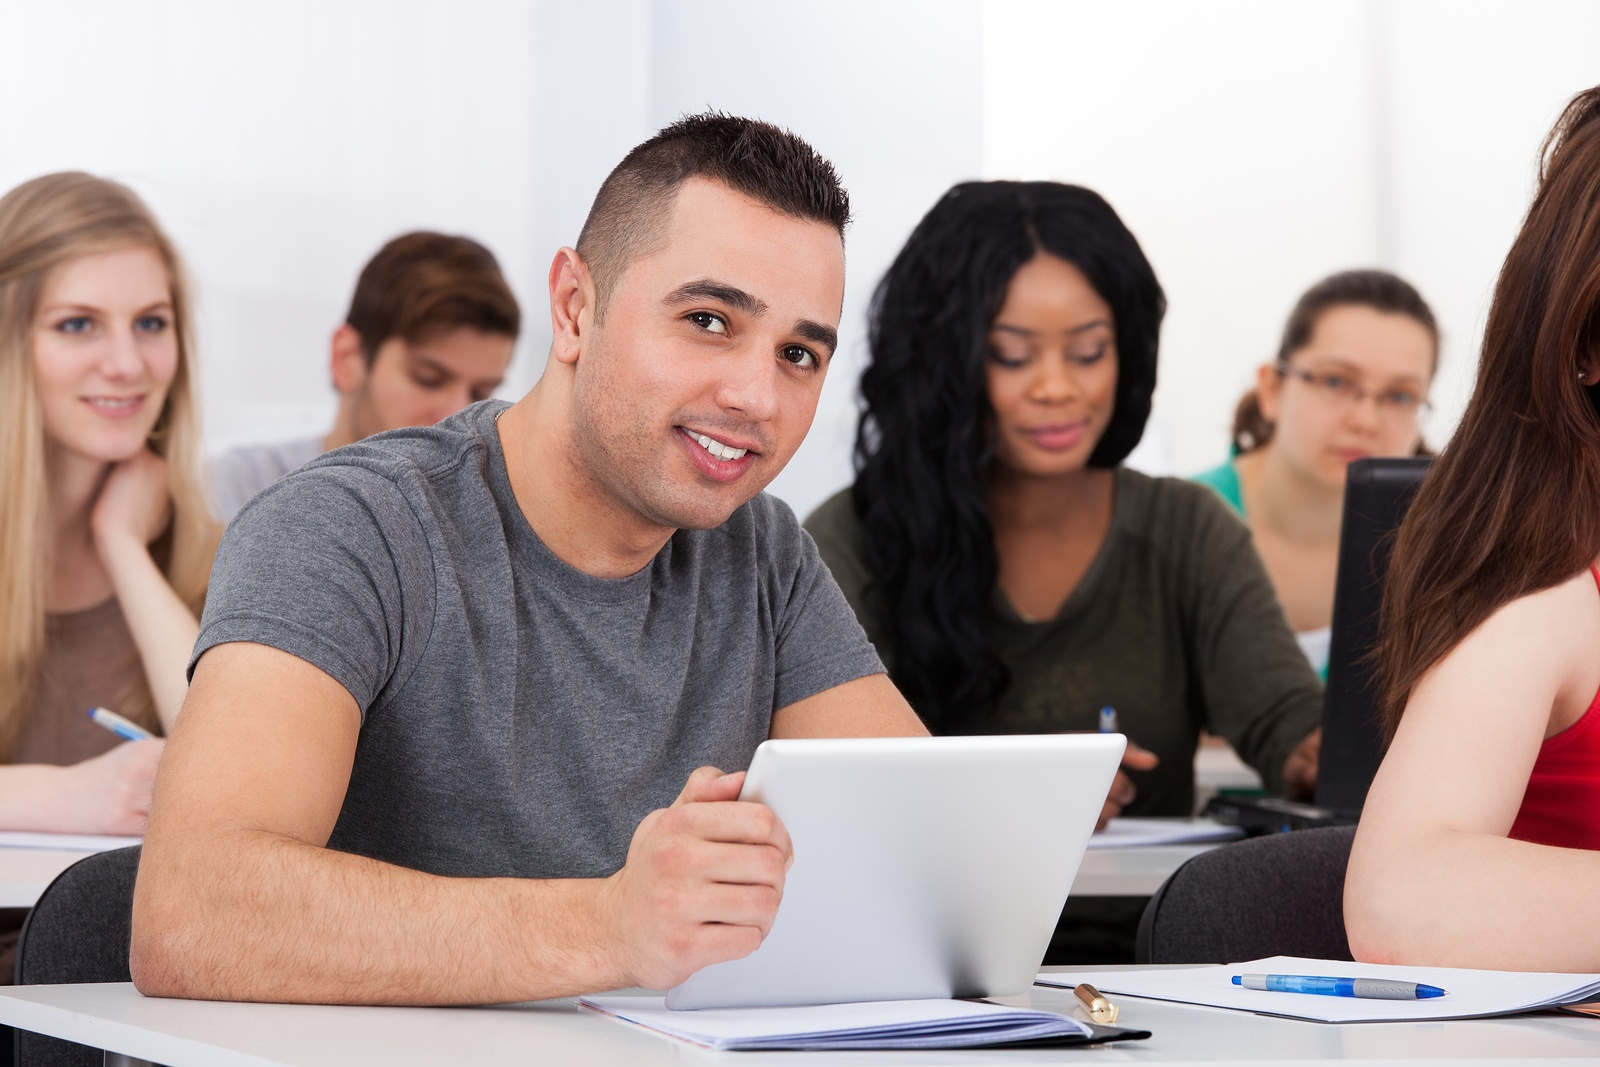 bigstock-Confident-Male-Student-Holding-72293533